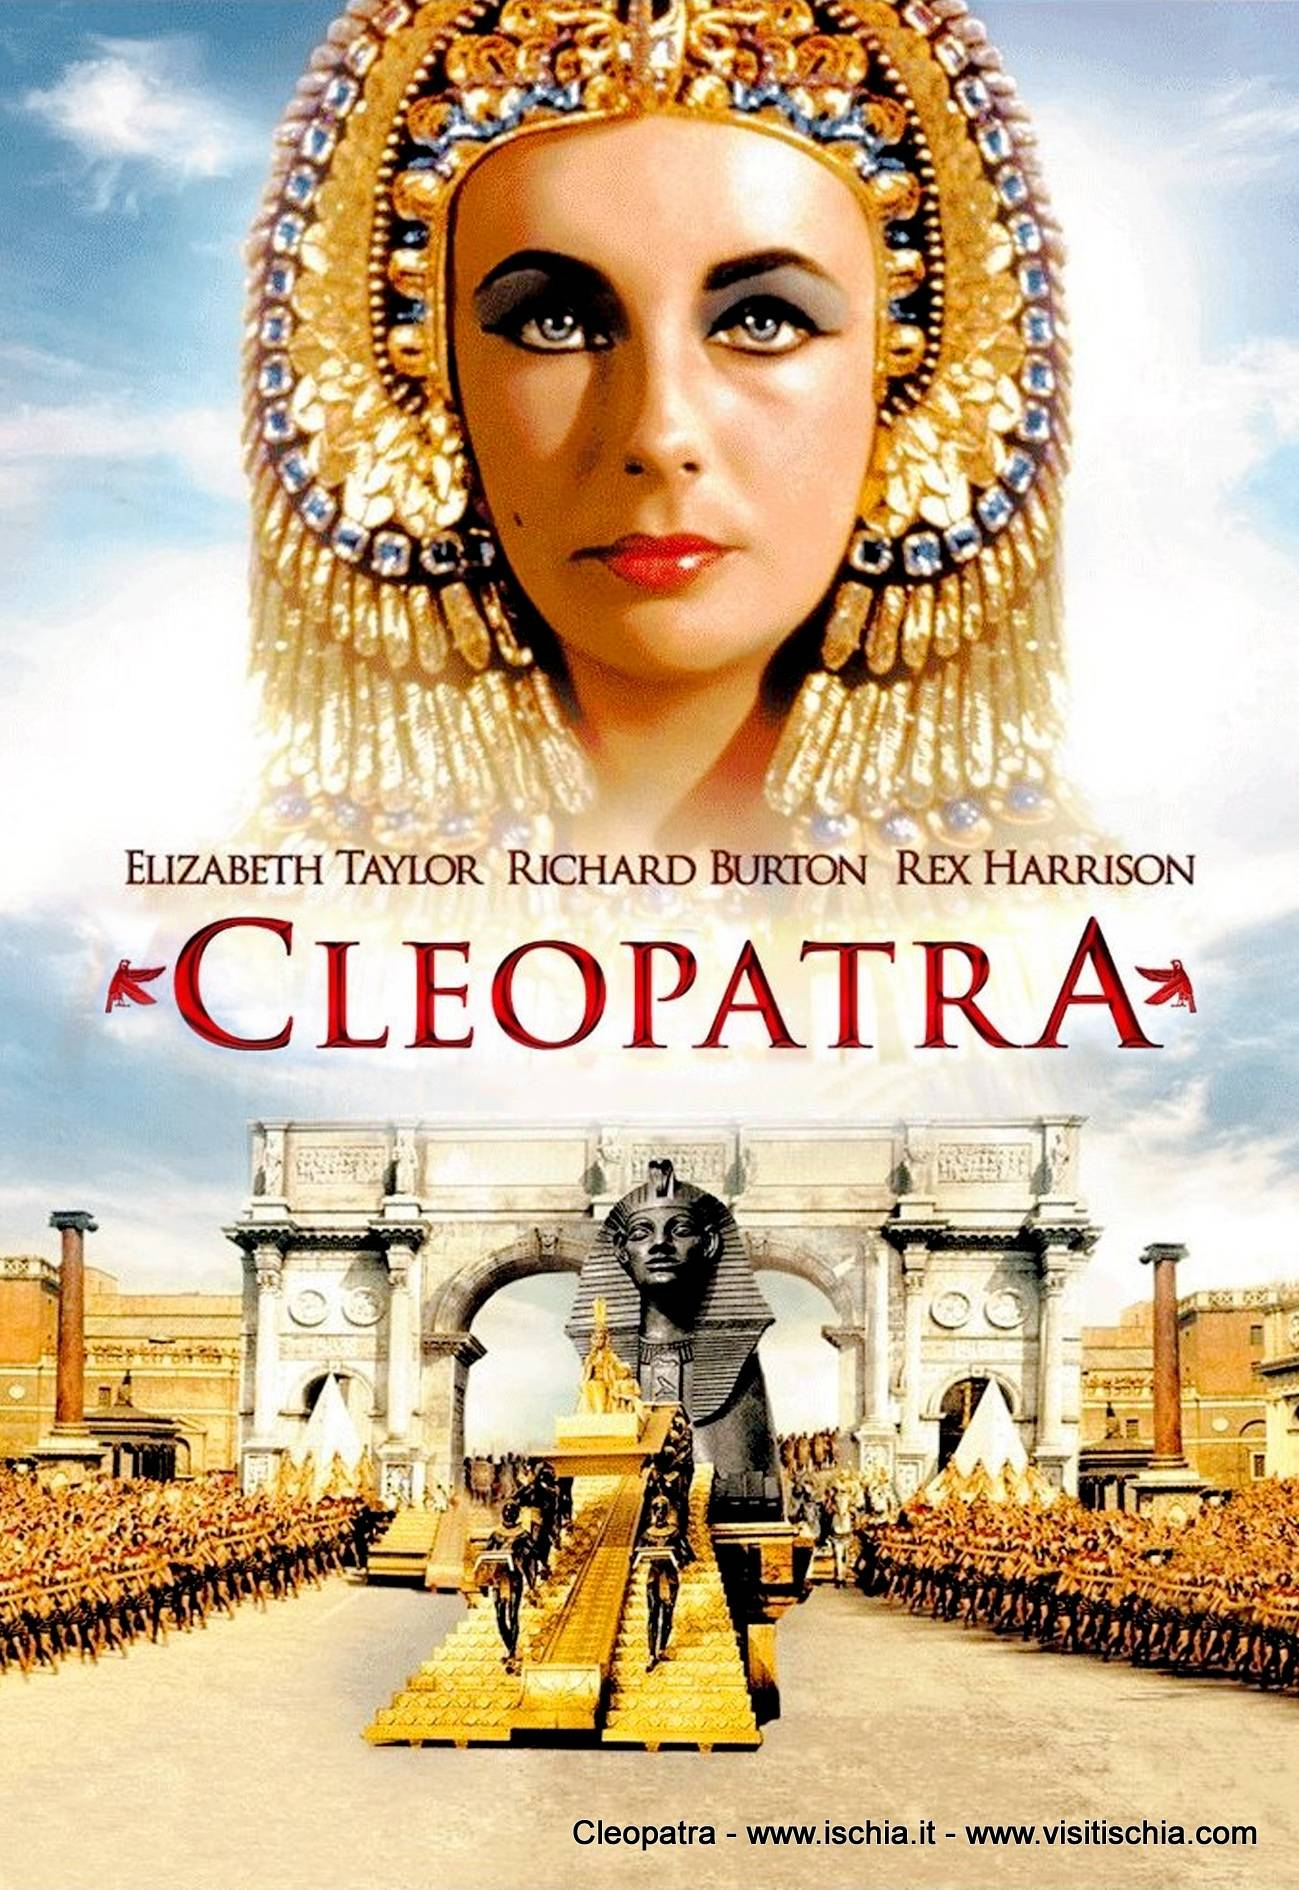 cleopatra1963manifestoischia-9b2037f7a6ebcf5ca615bf48cd85c08b.jpg